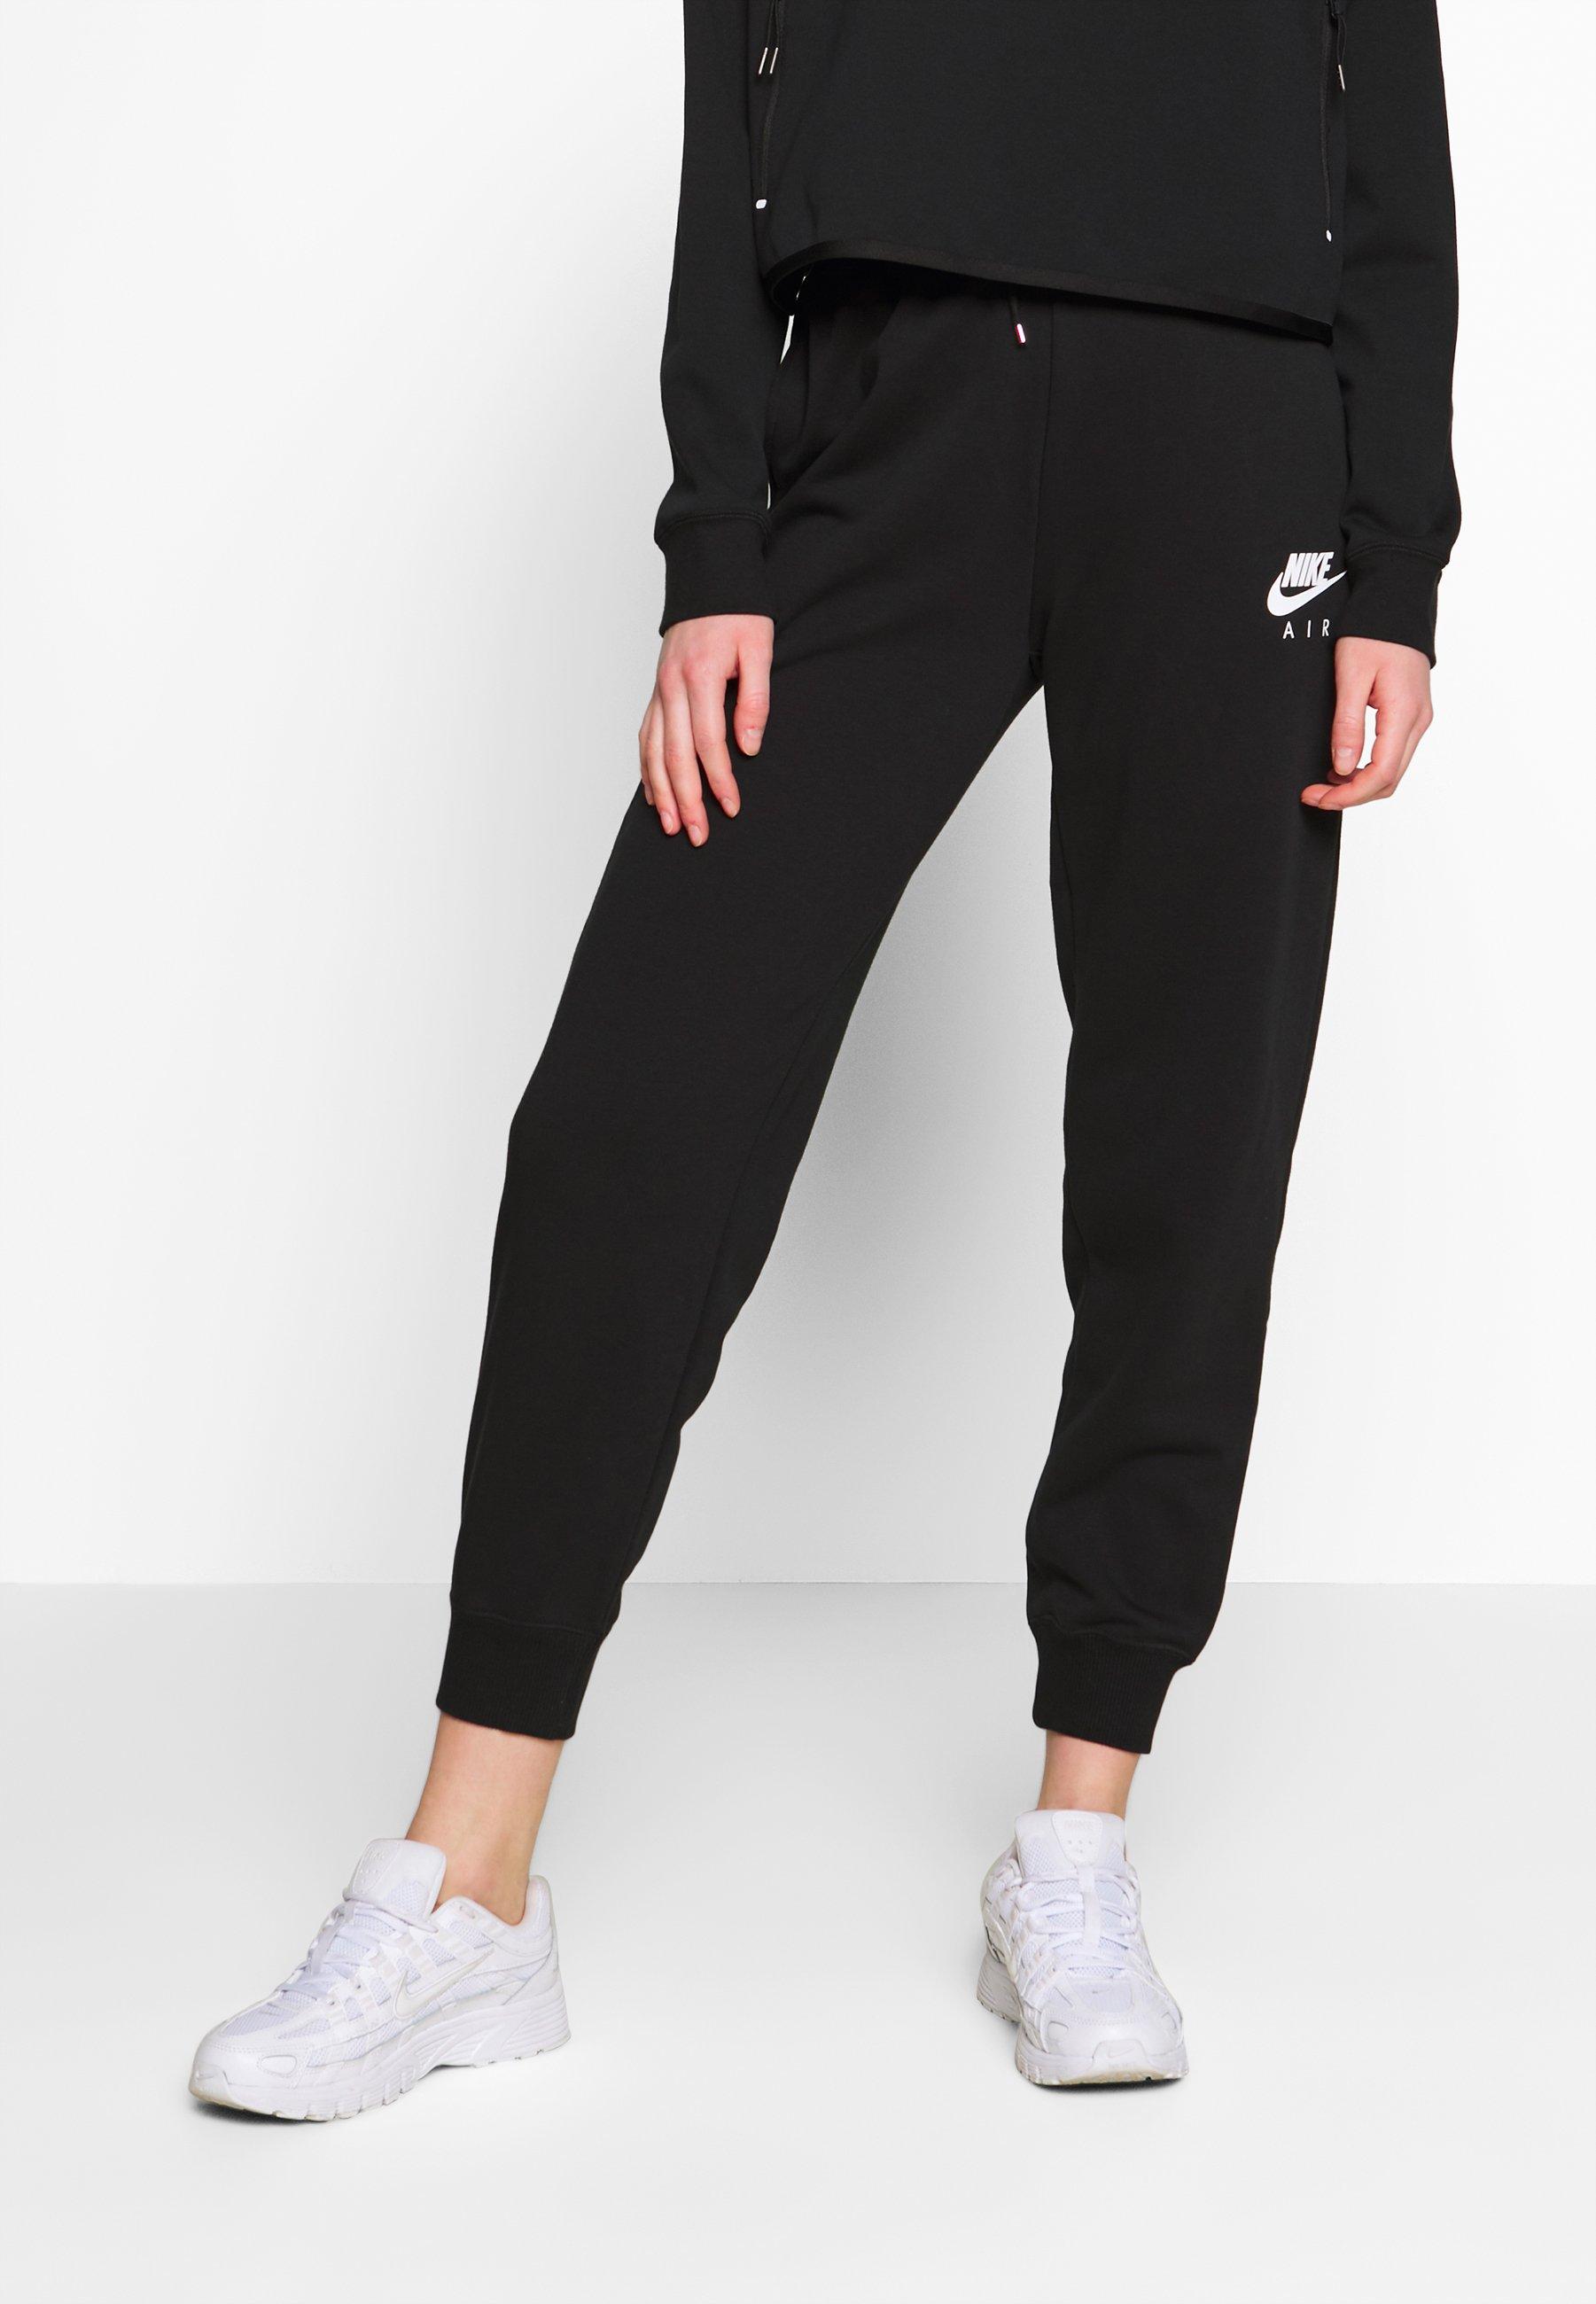 Nike Sportswear Legginsit NSW Air 78 Rib BlackIce Silver